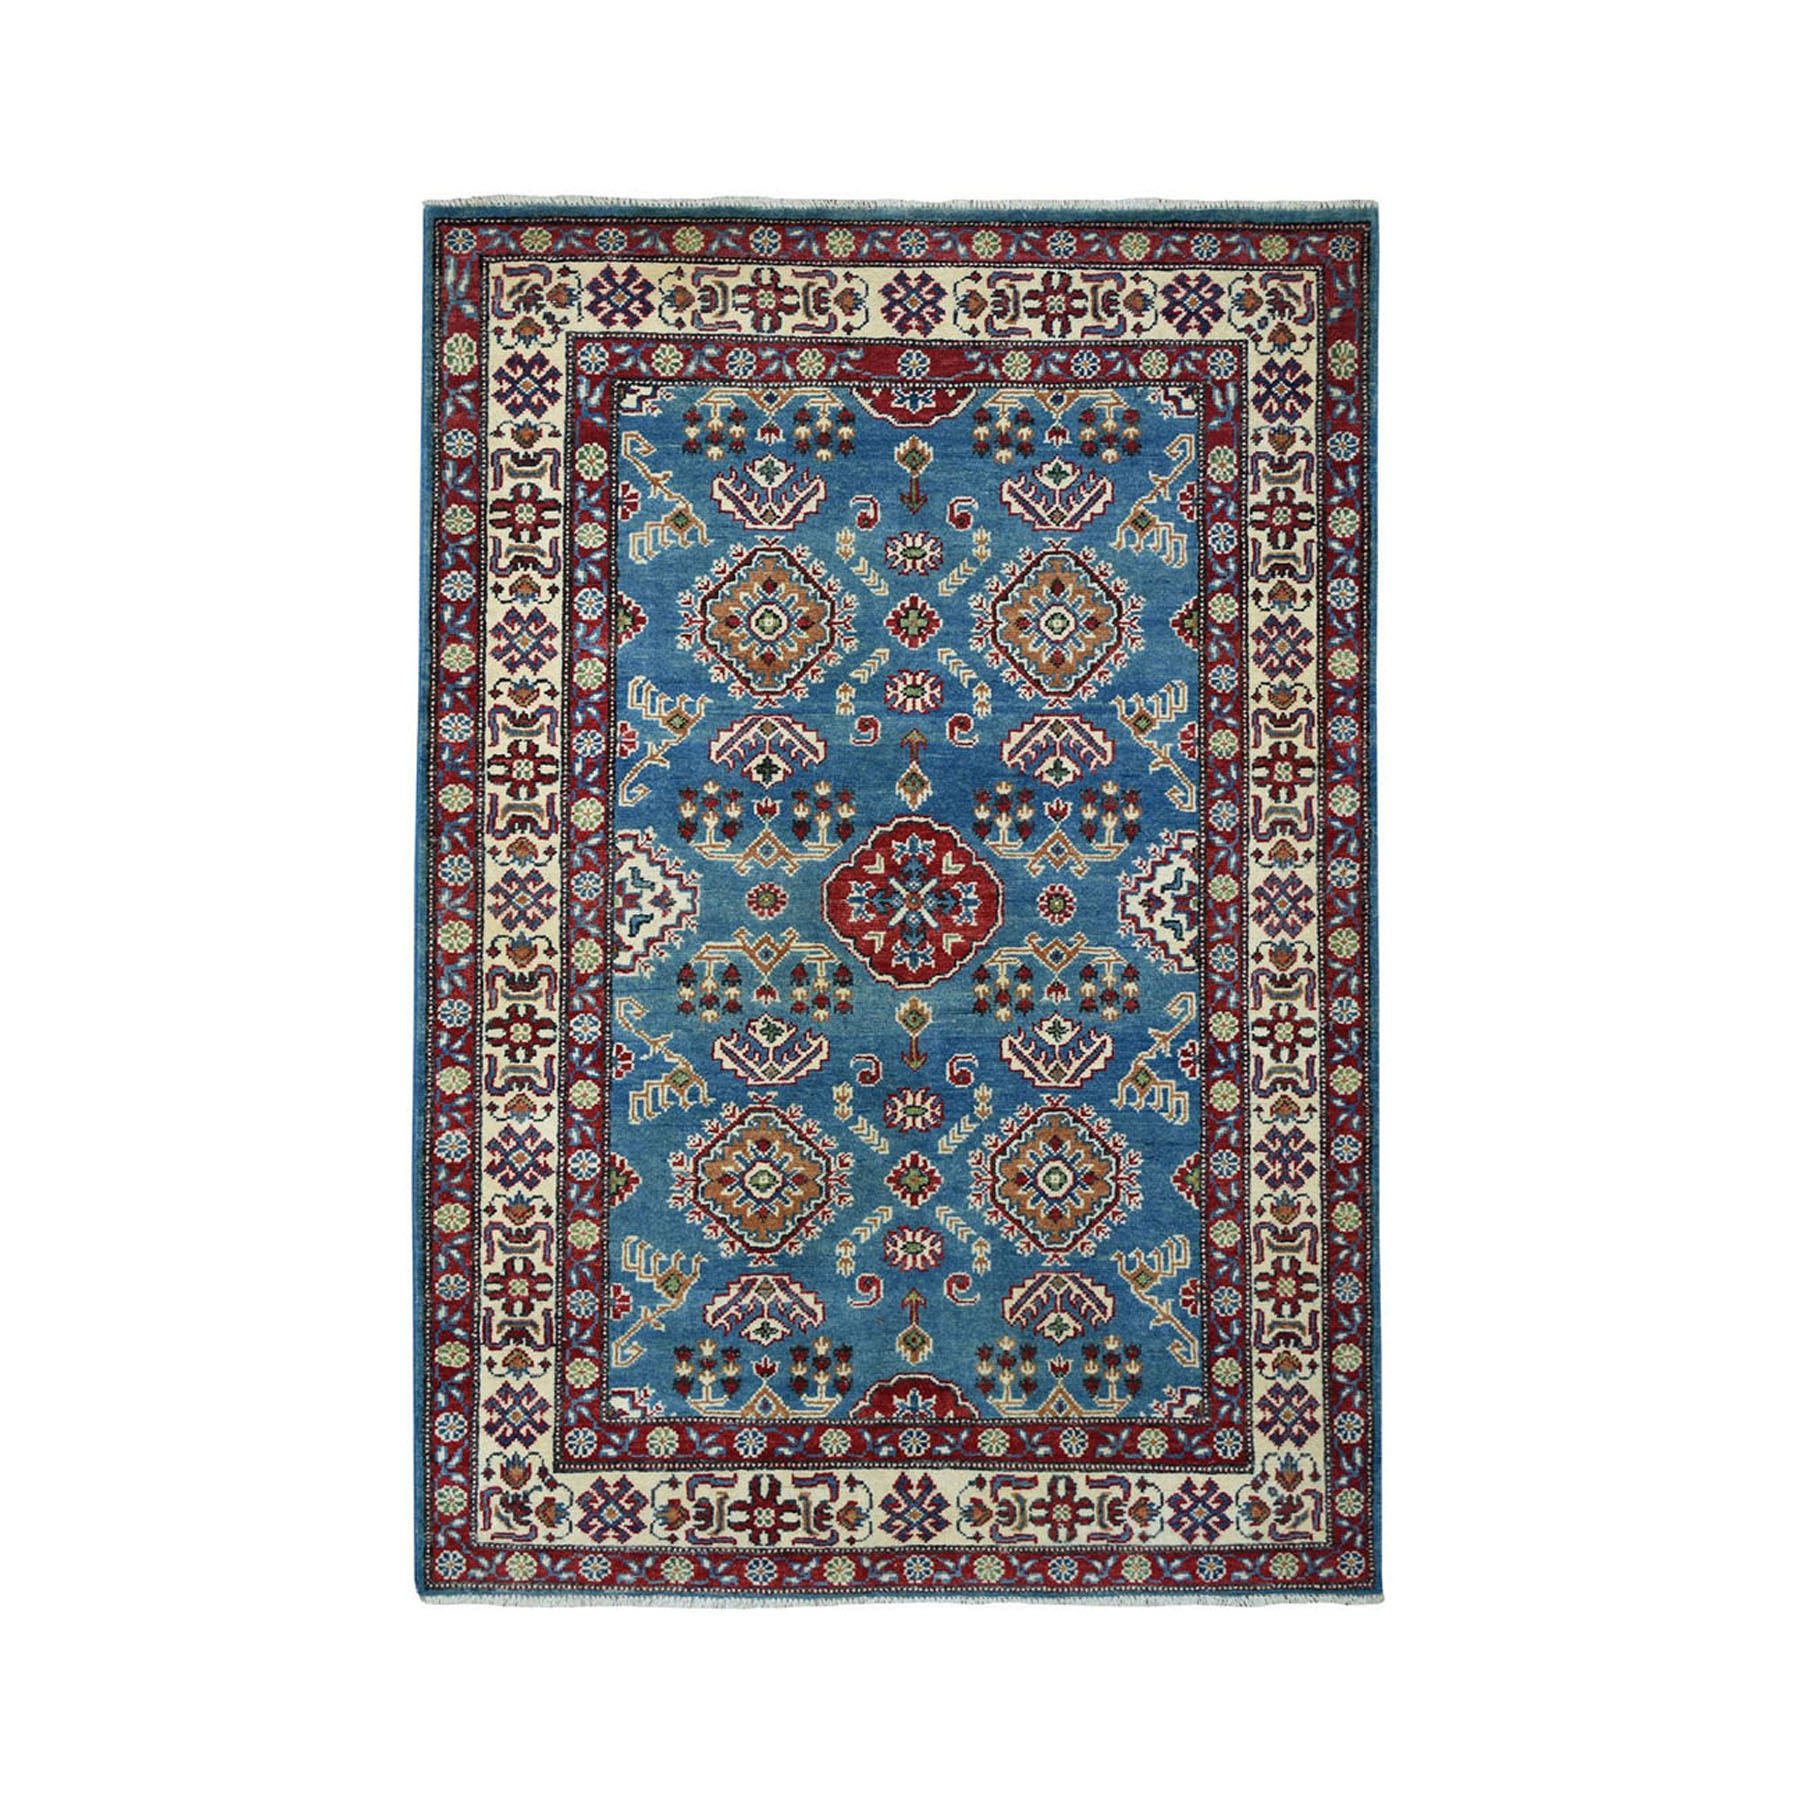 4'X6' Blue Geometric Design Kazak Pure Wool Hand-Knotted Oriental Rug moae069e